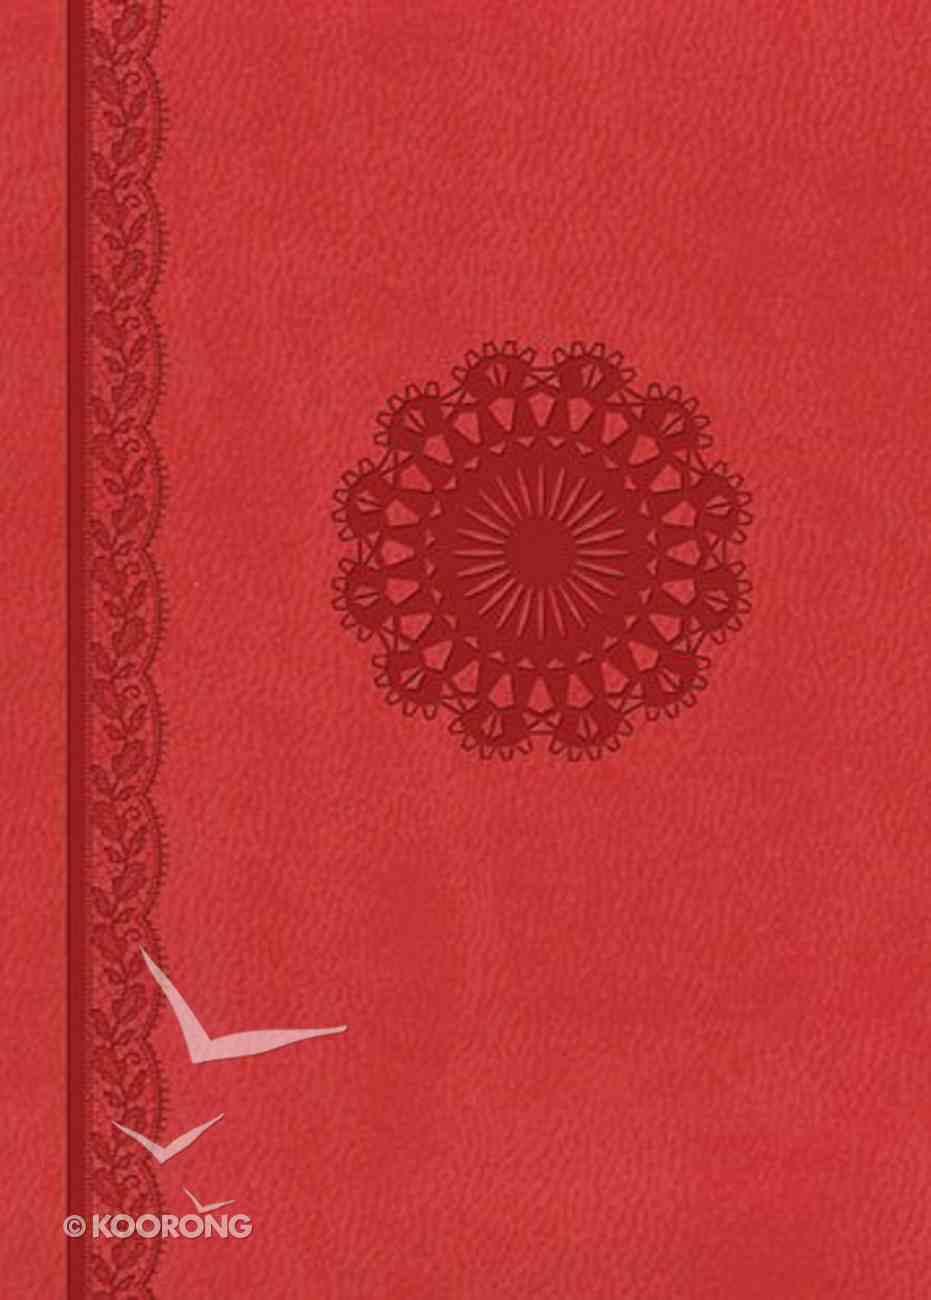 NIV Macarthur Study Bible Signature Series Sunset Pink Imitation Leather